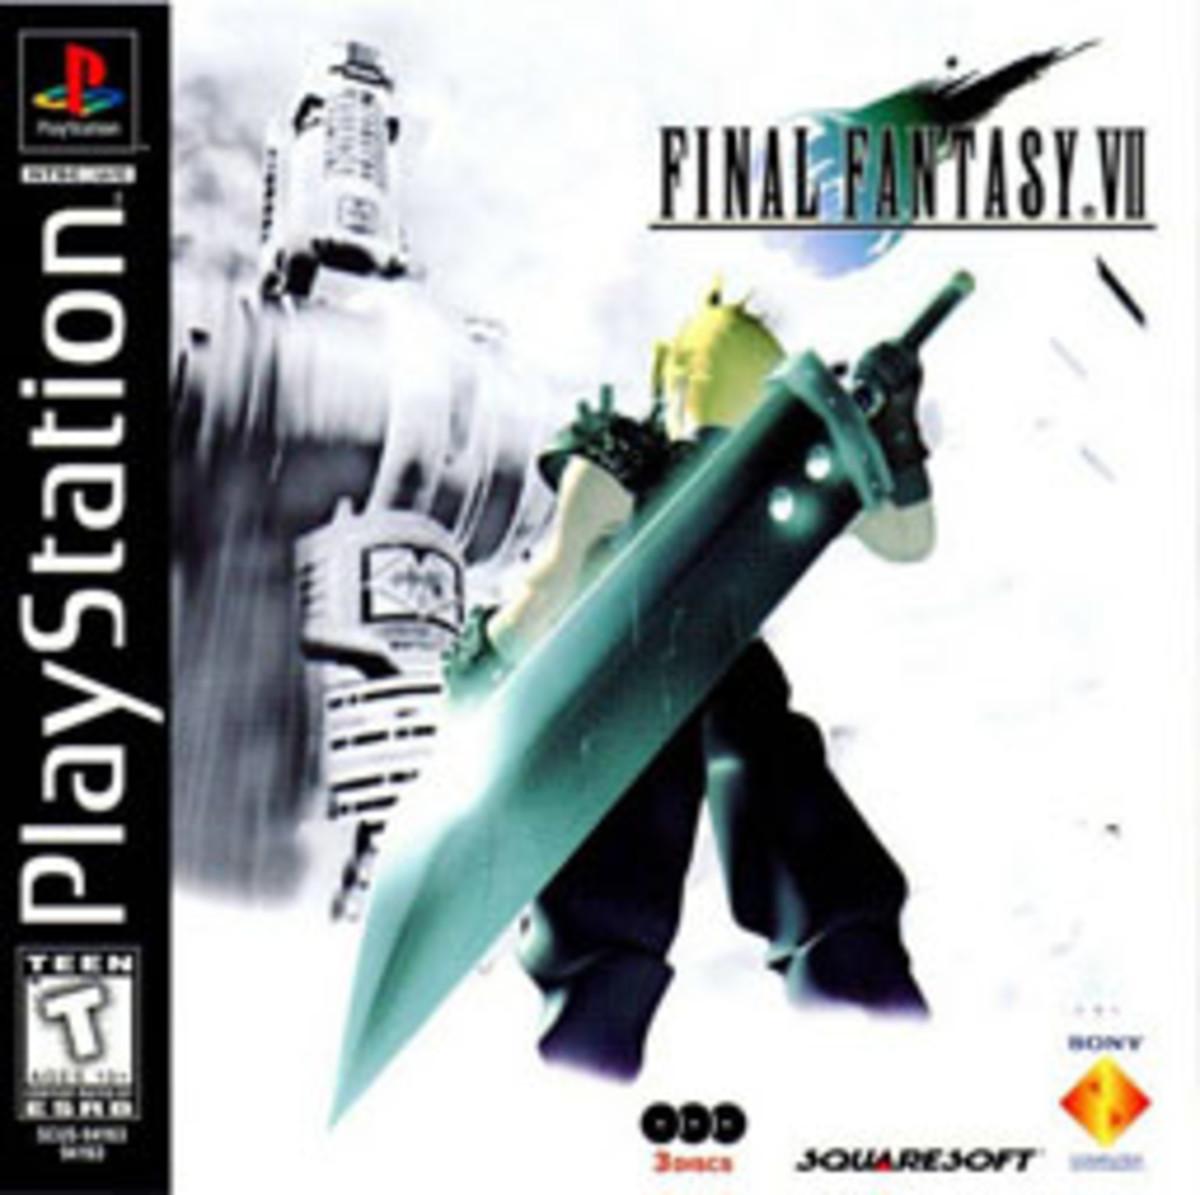 Final Fantasy VII box art.